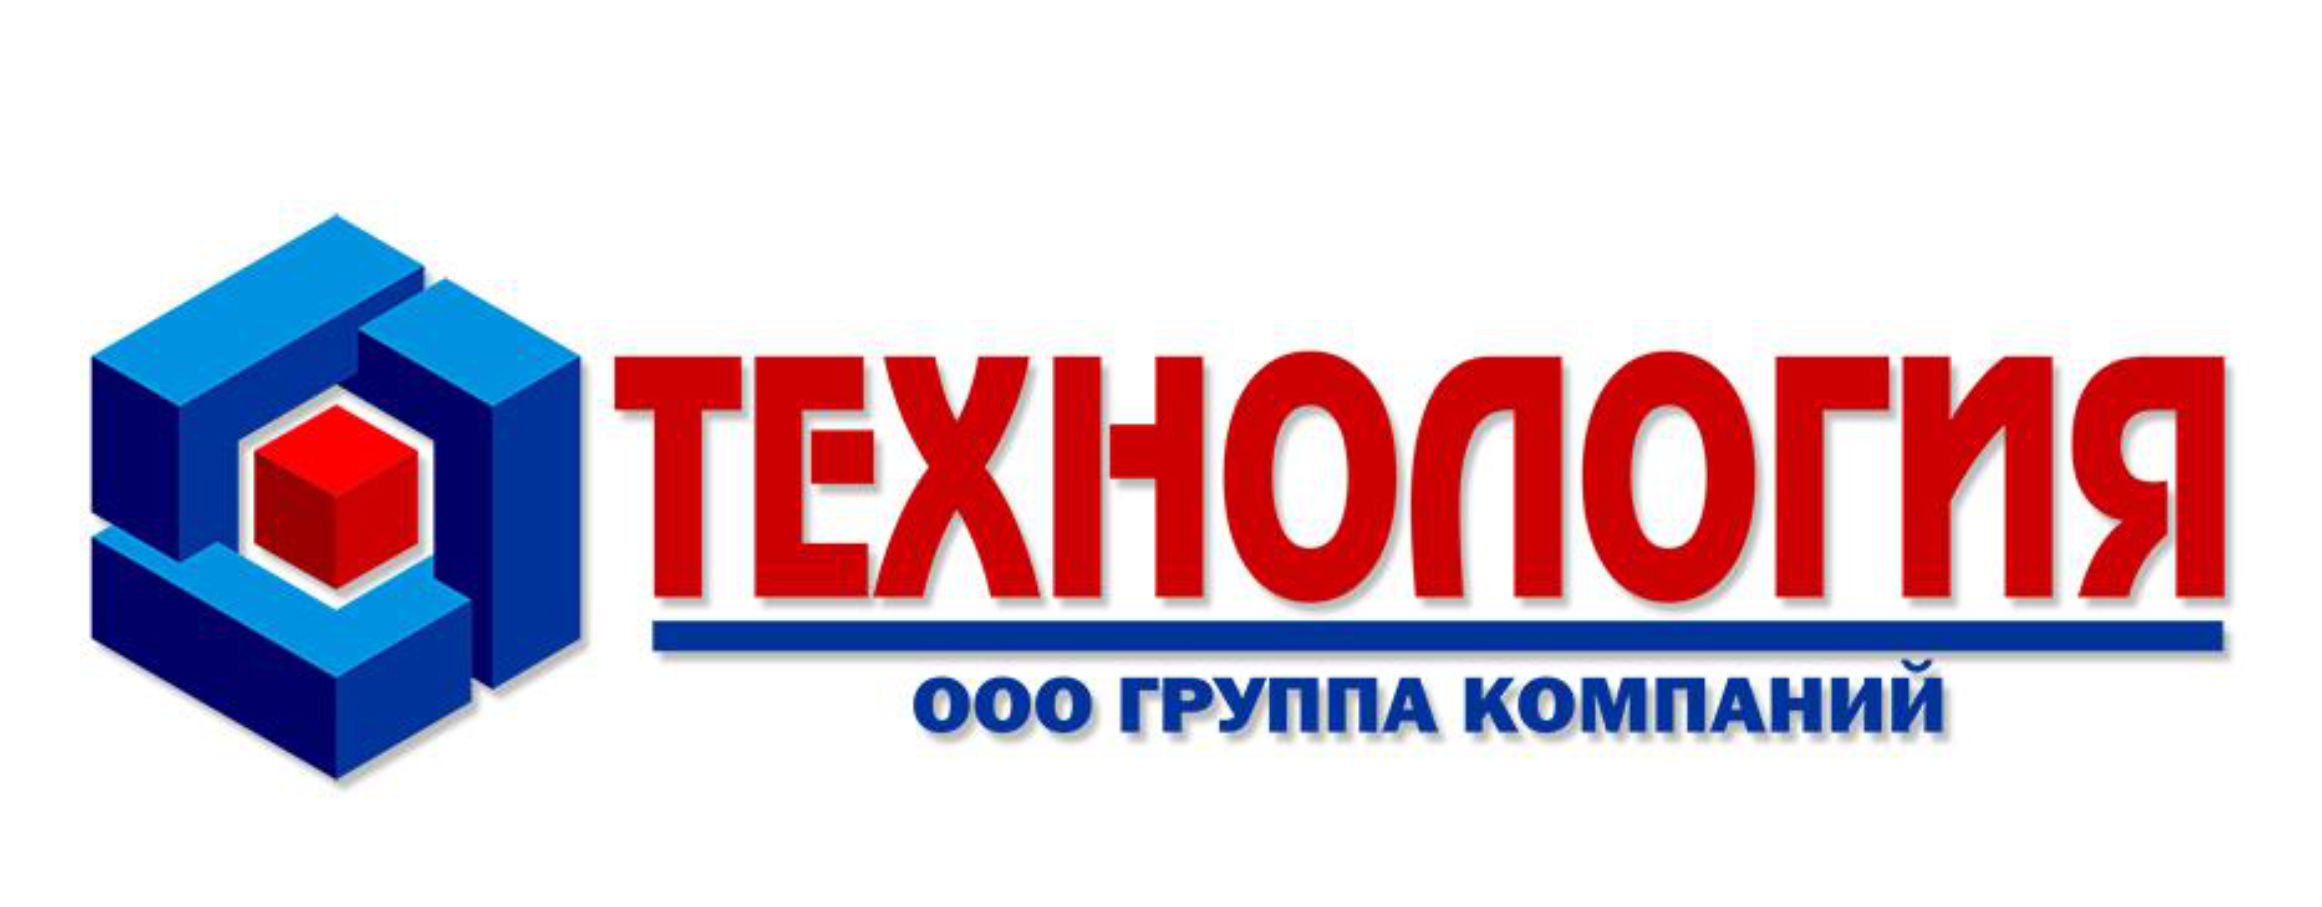 Сантехника каталог предприятий сантехника arcon